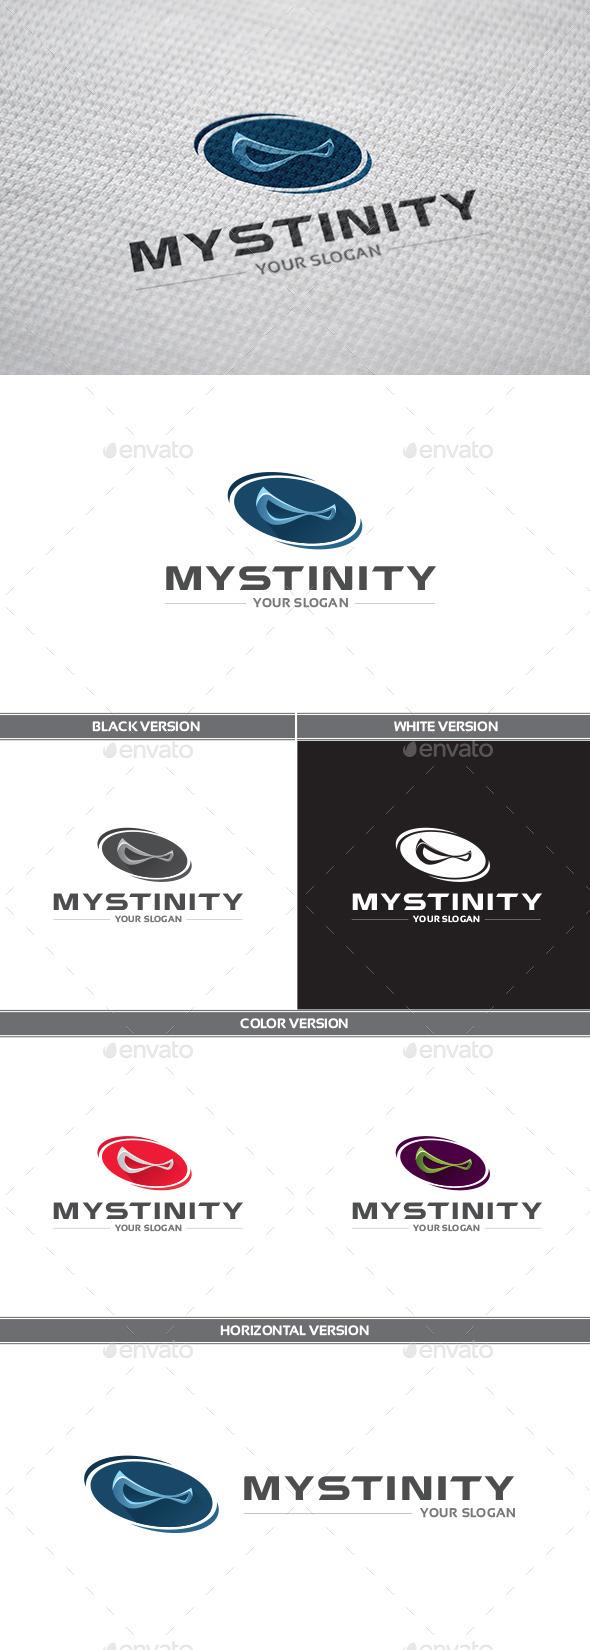 GraphicRiver Mystinity Logo 9932766